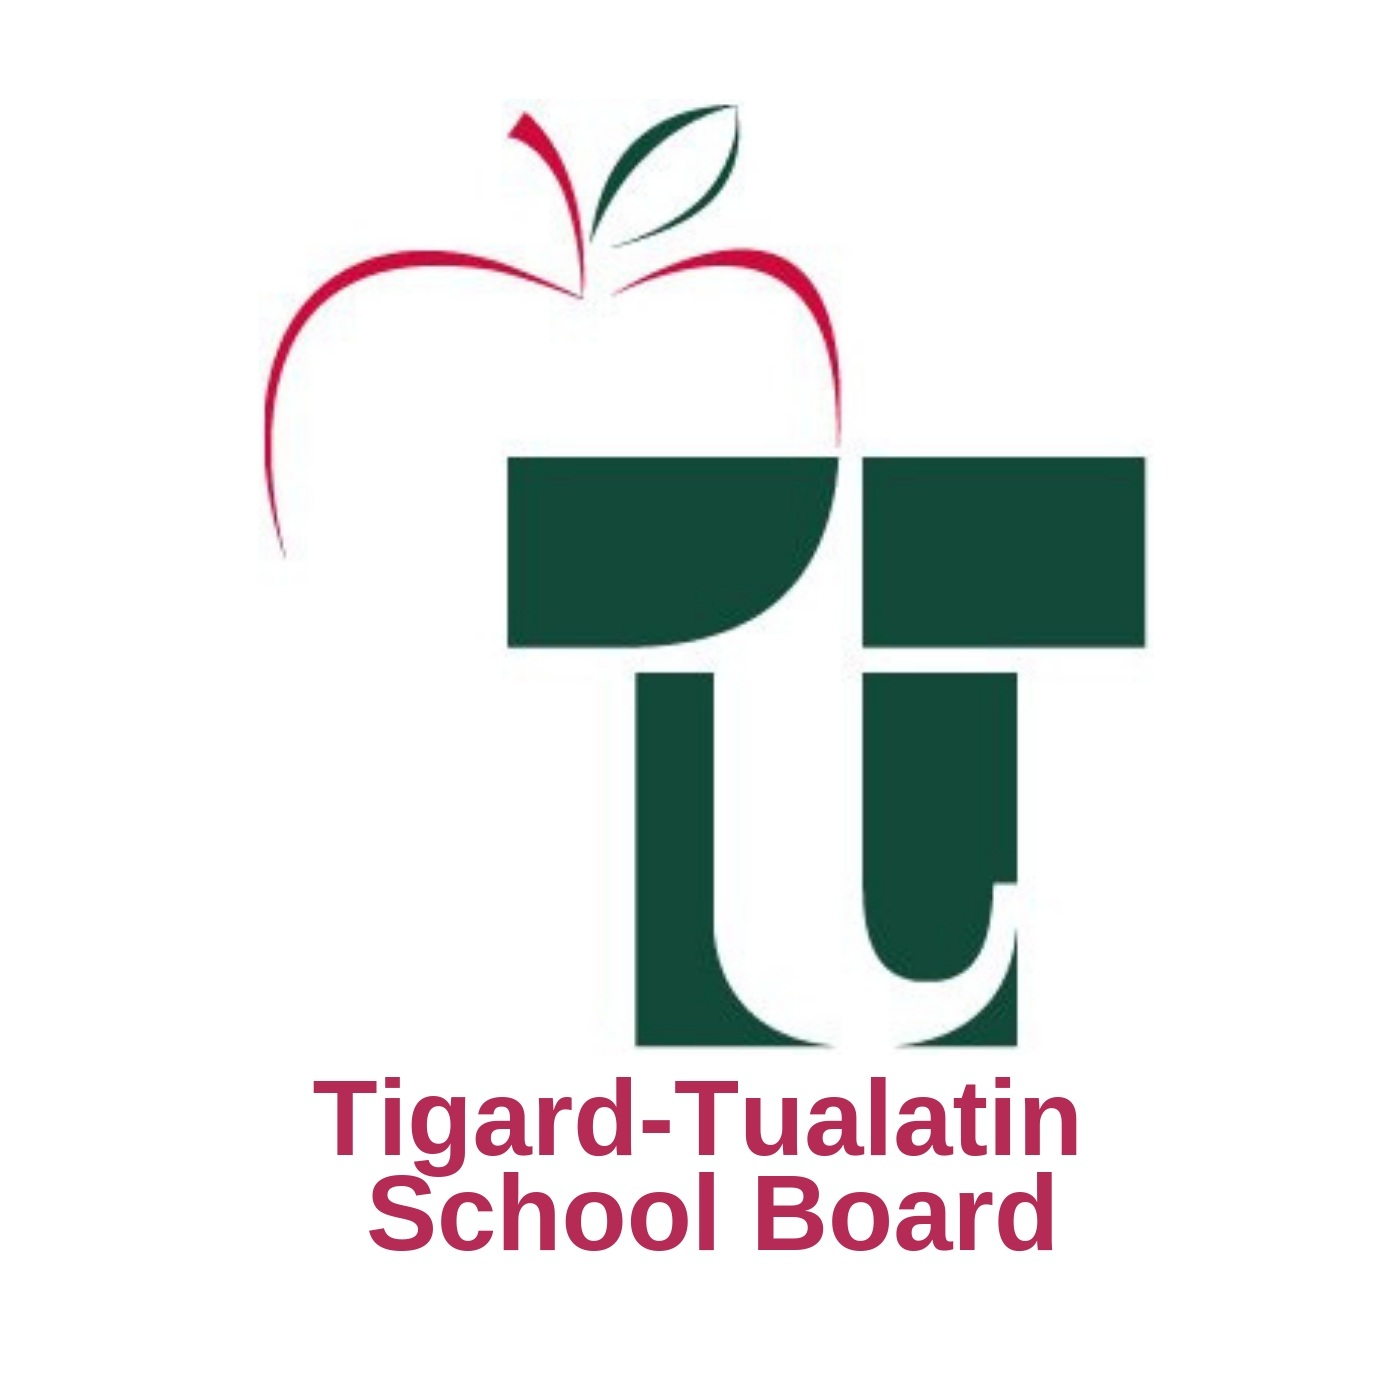 Tigard Tualatin school board logo